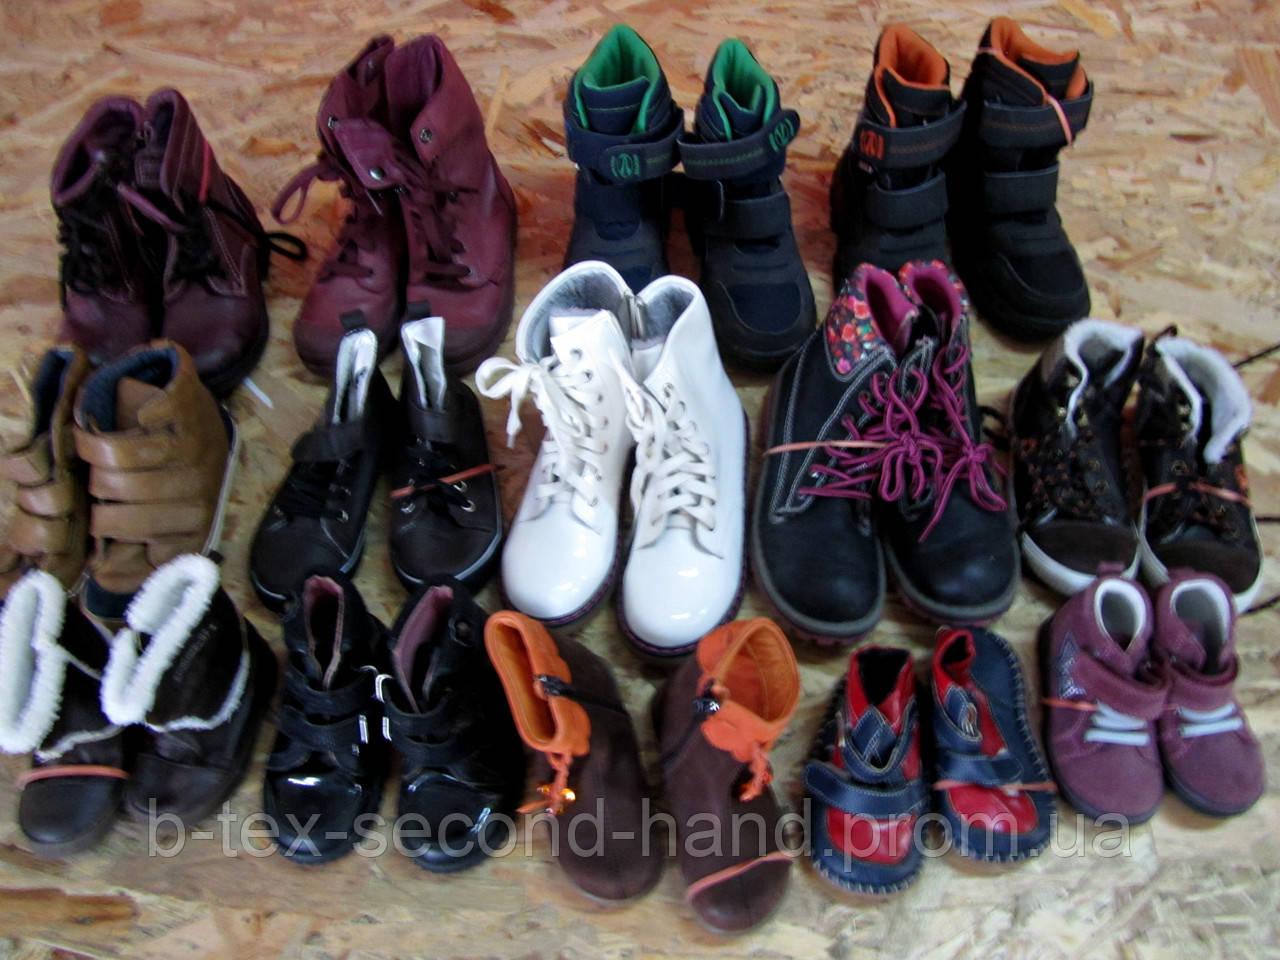 Взуття дитяче зима, Обувь детская, секонд хенд, Німеччина